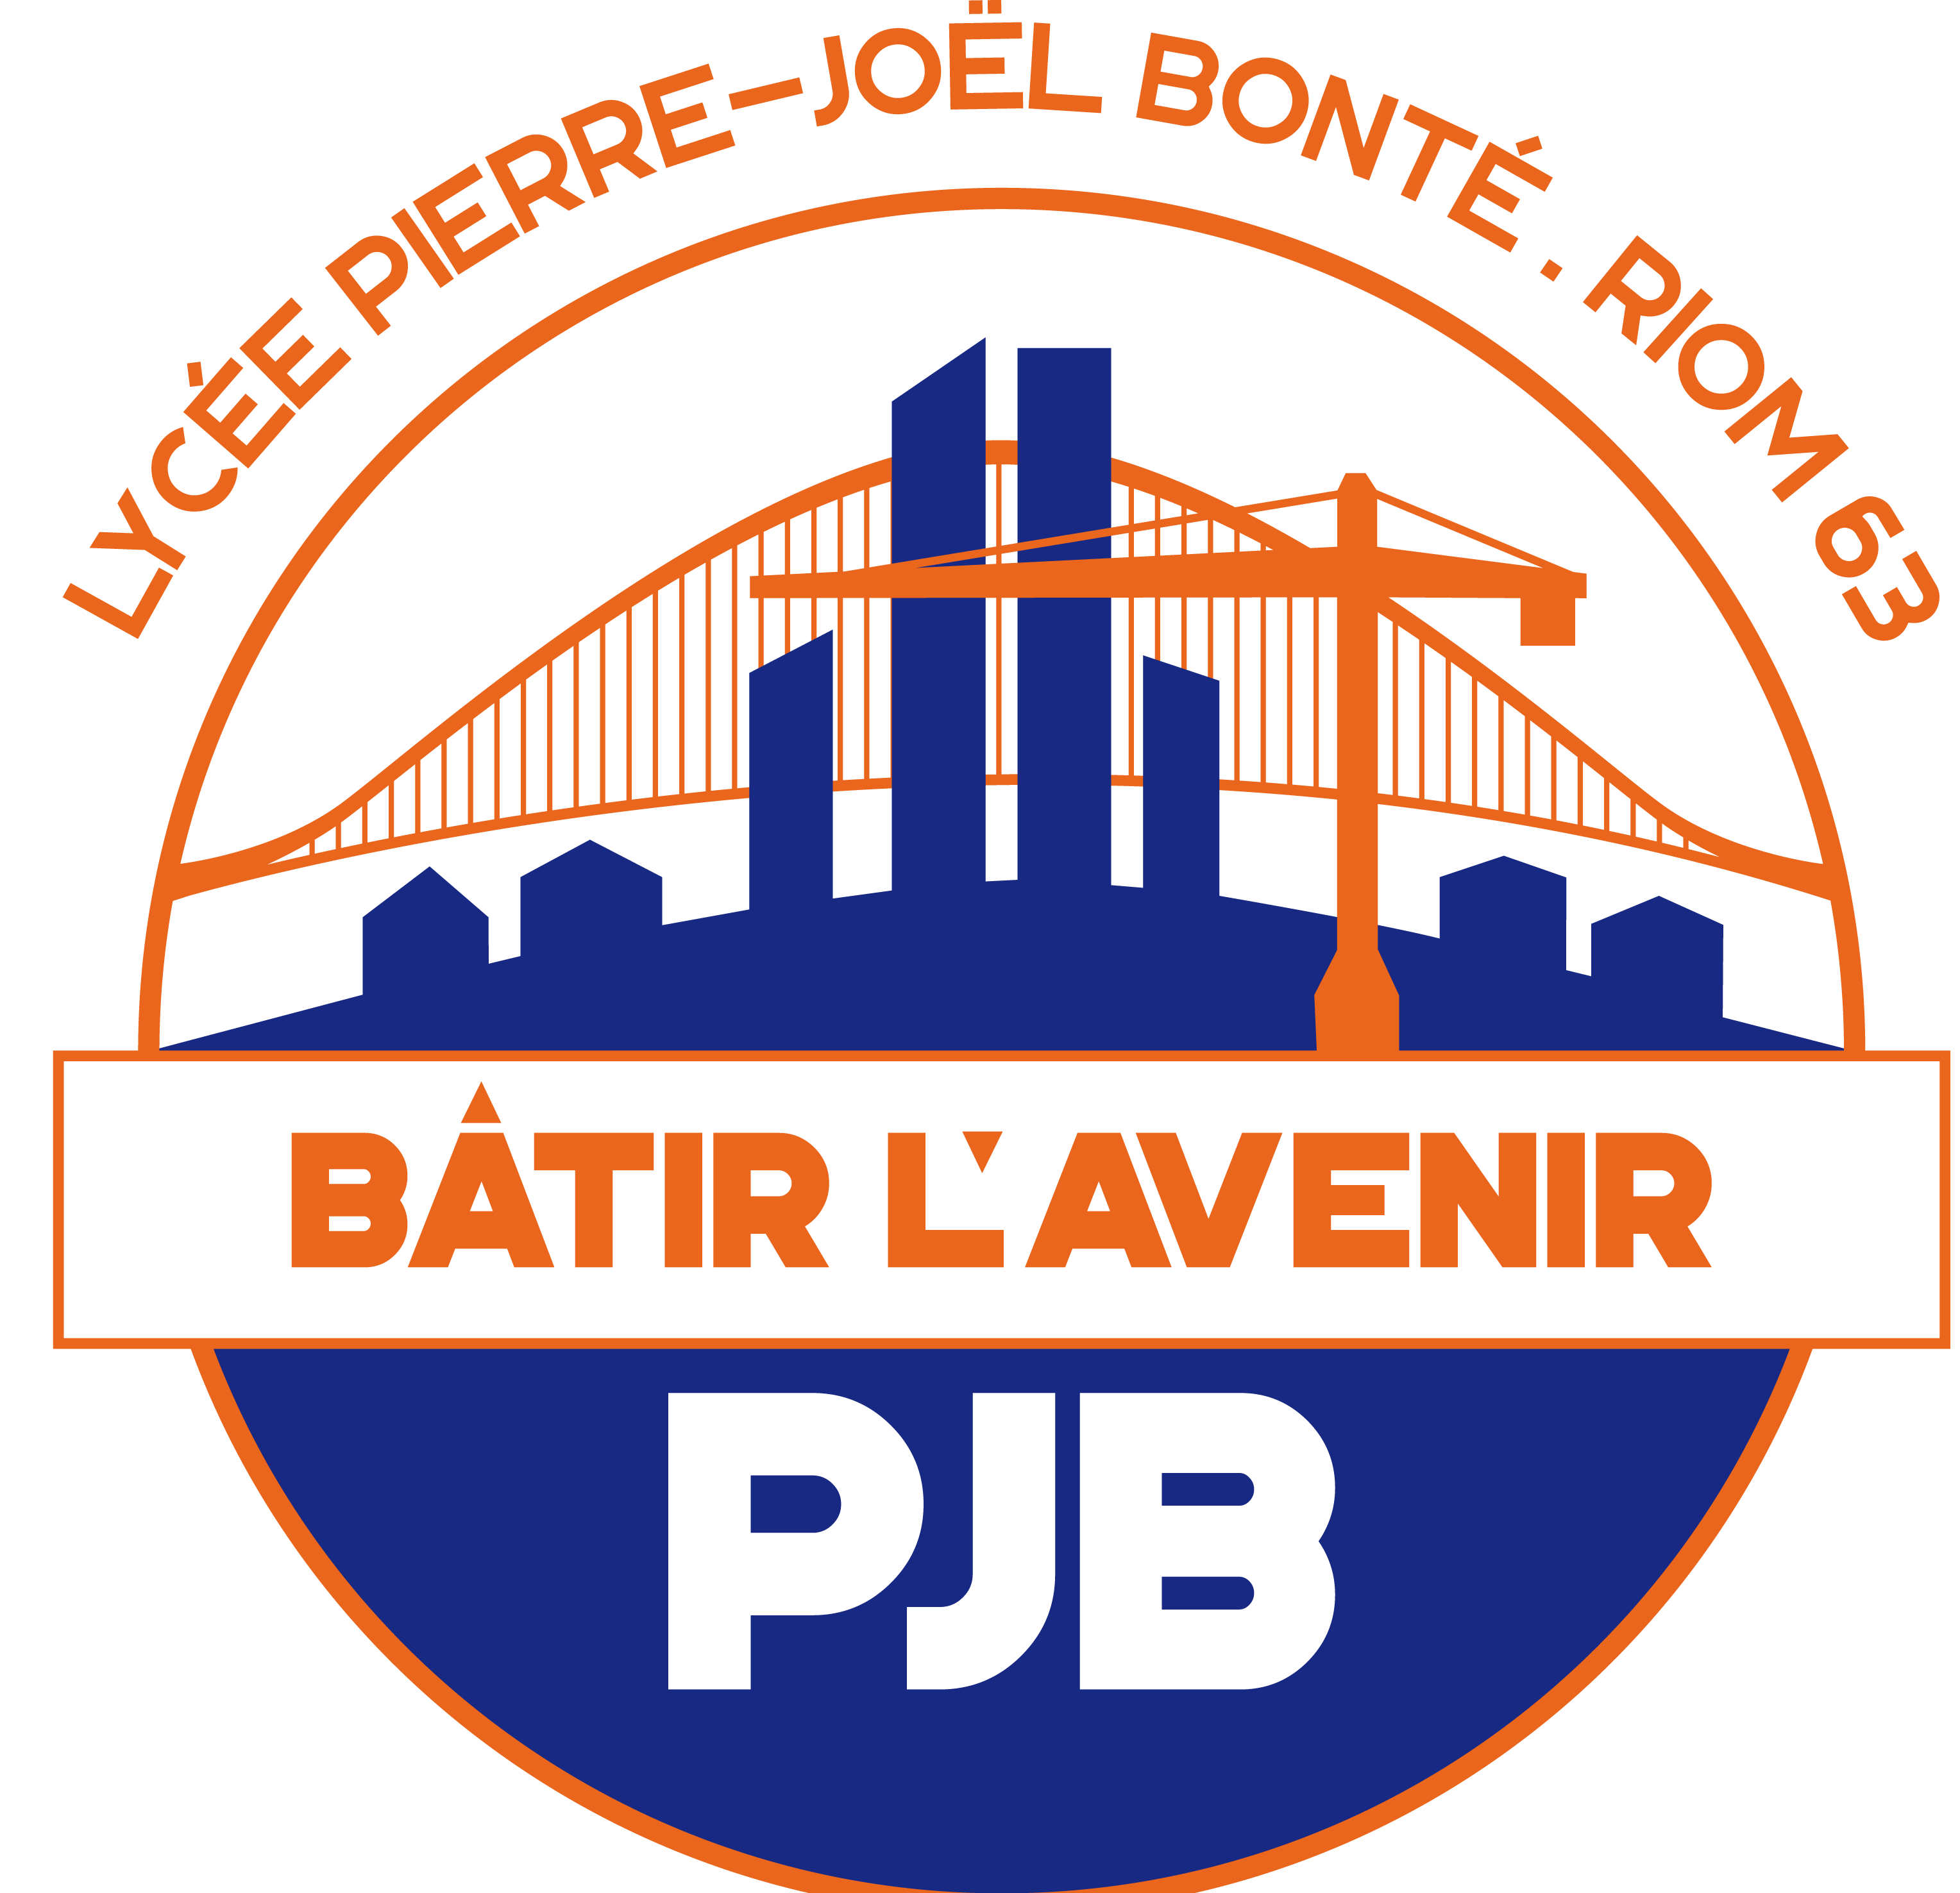 Logo_PJB_couleur_2019 b.png